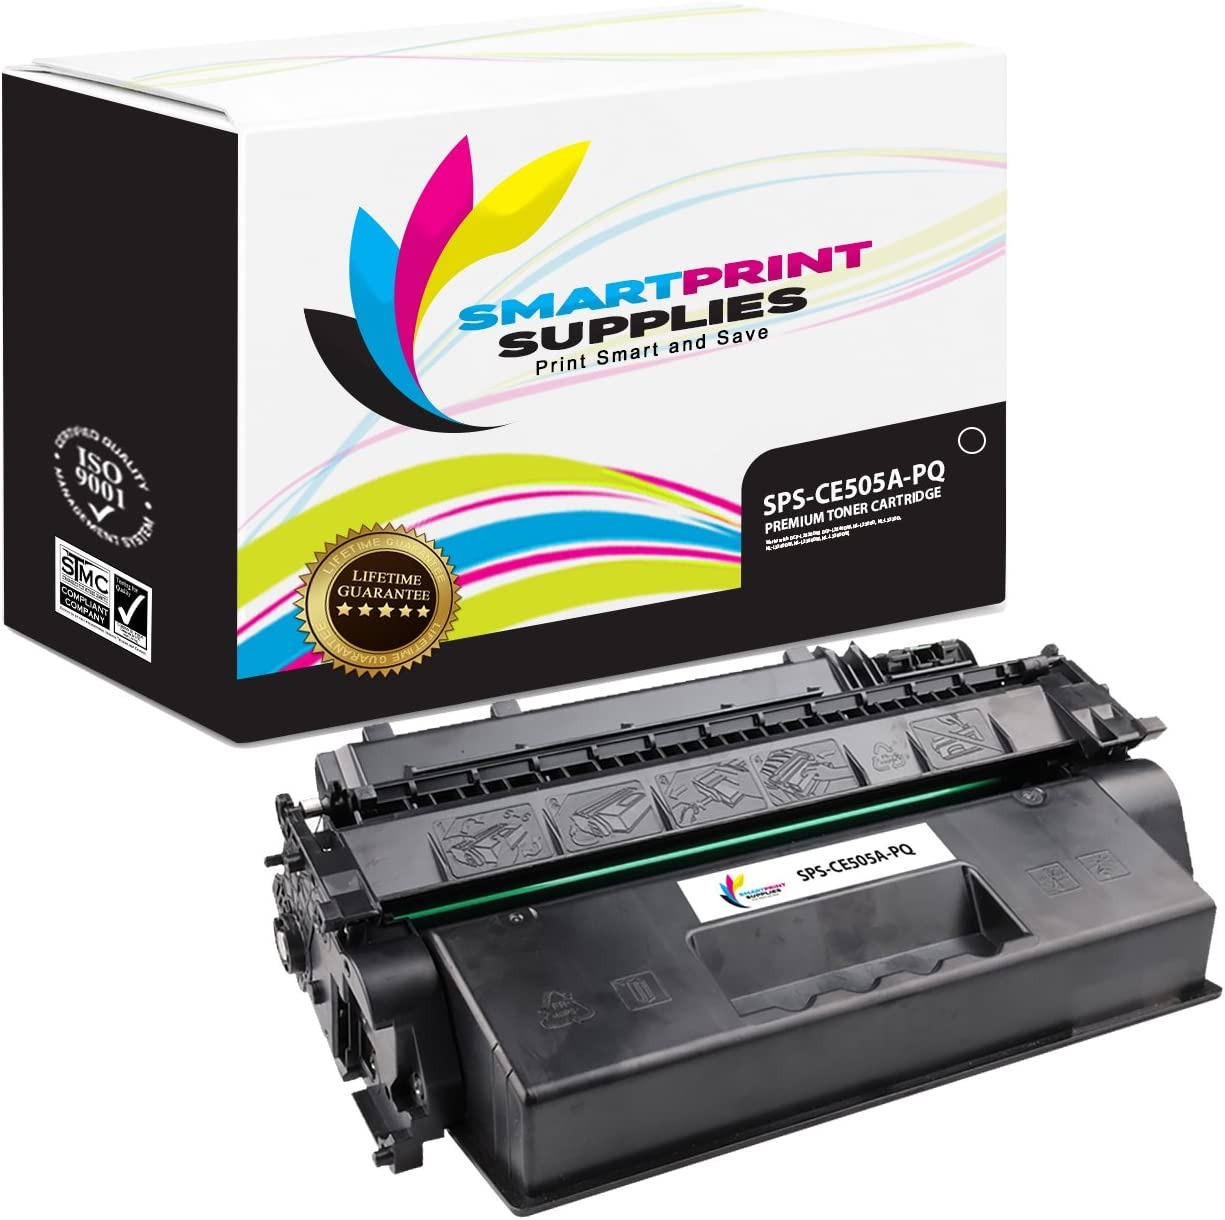 Smart Print Supplies Compatible 05A CE505A Black Premium Toner Cartridge Replacement for HP Laserjet P2030 2050 Series Printers 2,300 Pages 2 Pack